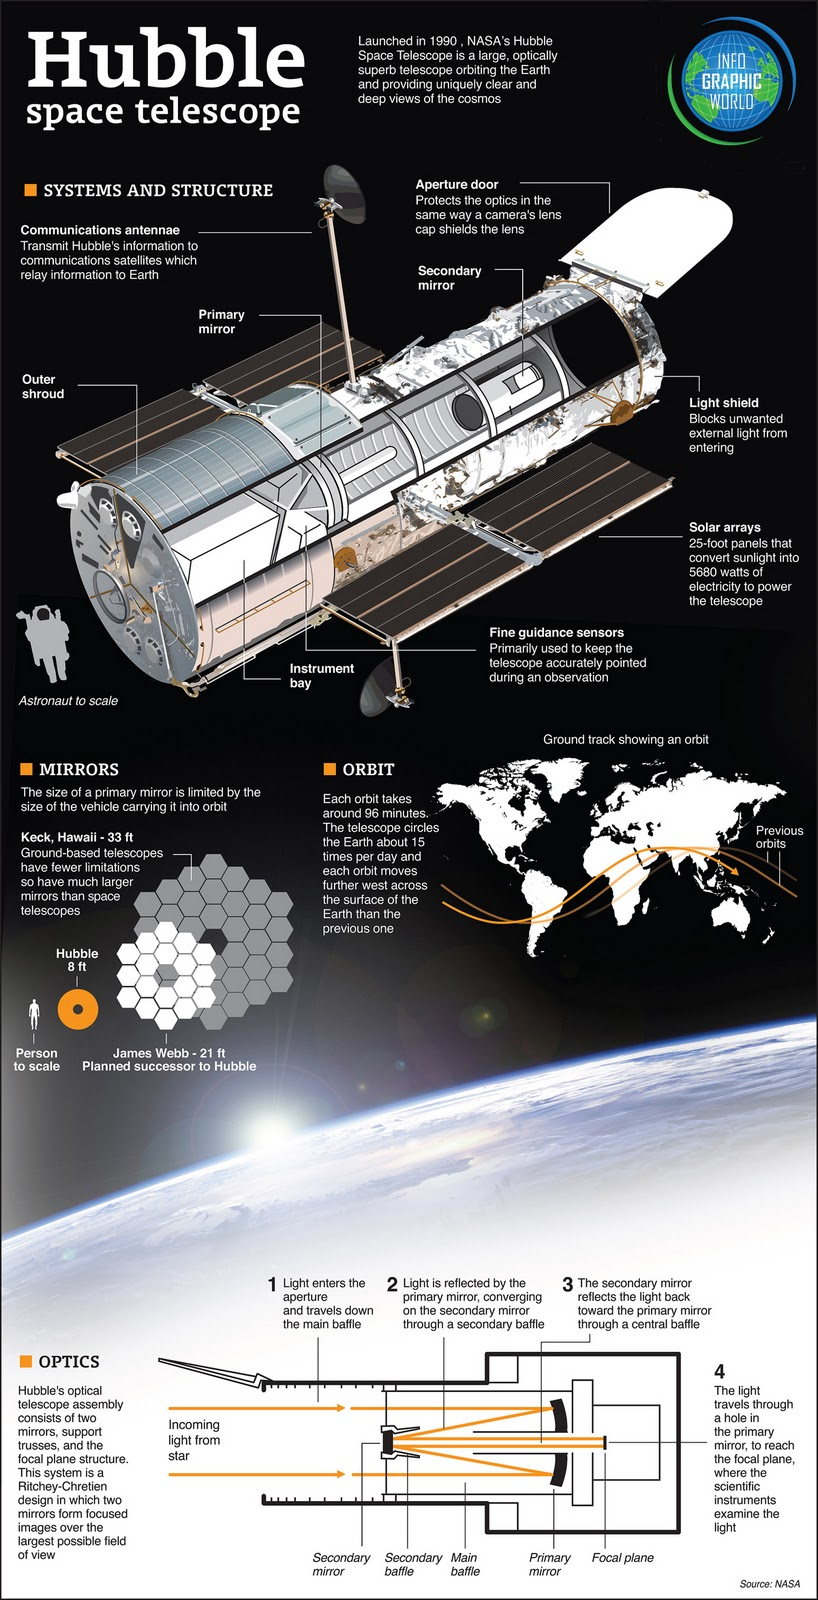 Suburban spaceman NASA Hubble Space Telescope HST